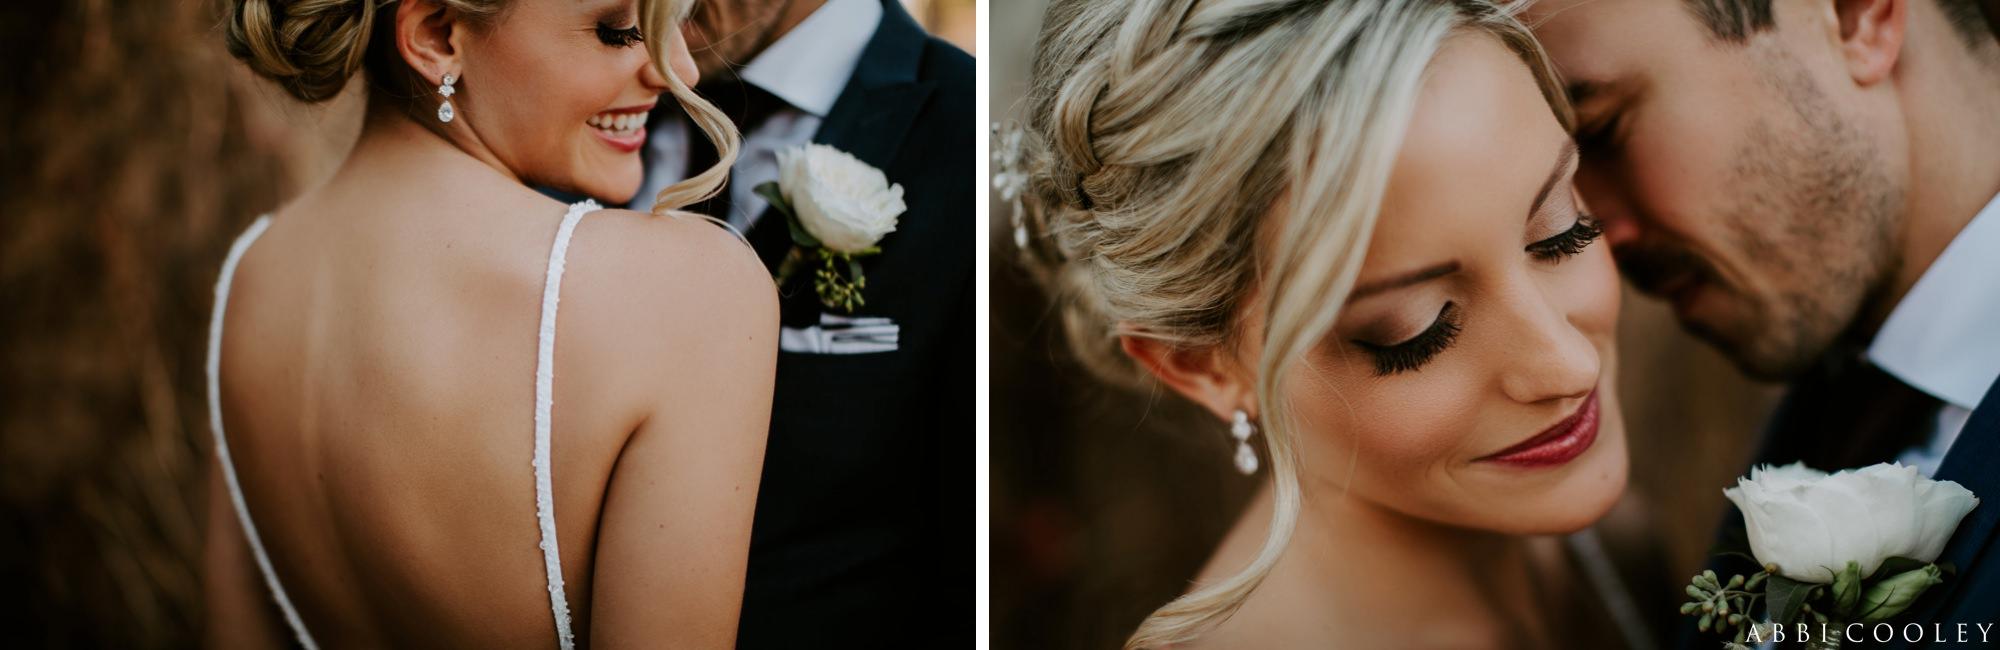 ABBI COOLEY WILSON CREEK WINERY TEMECULA WEDDING_0858